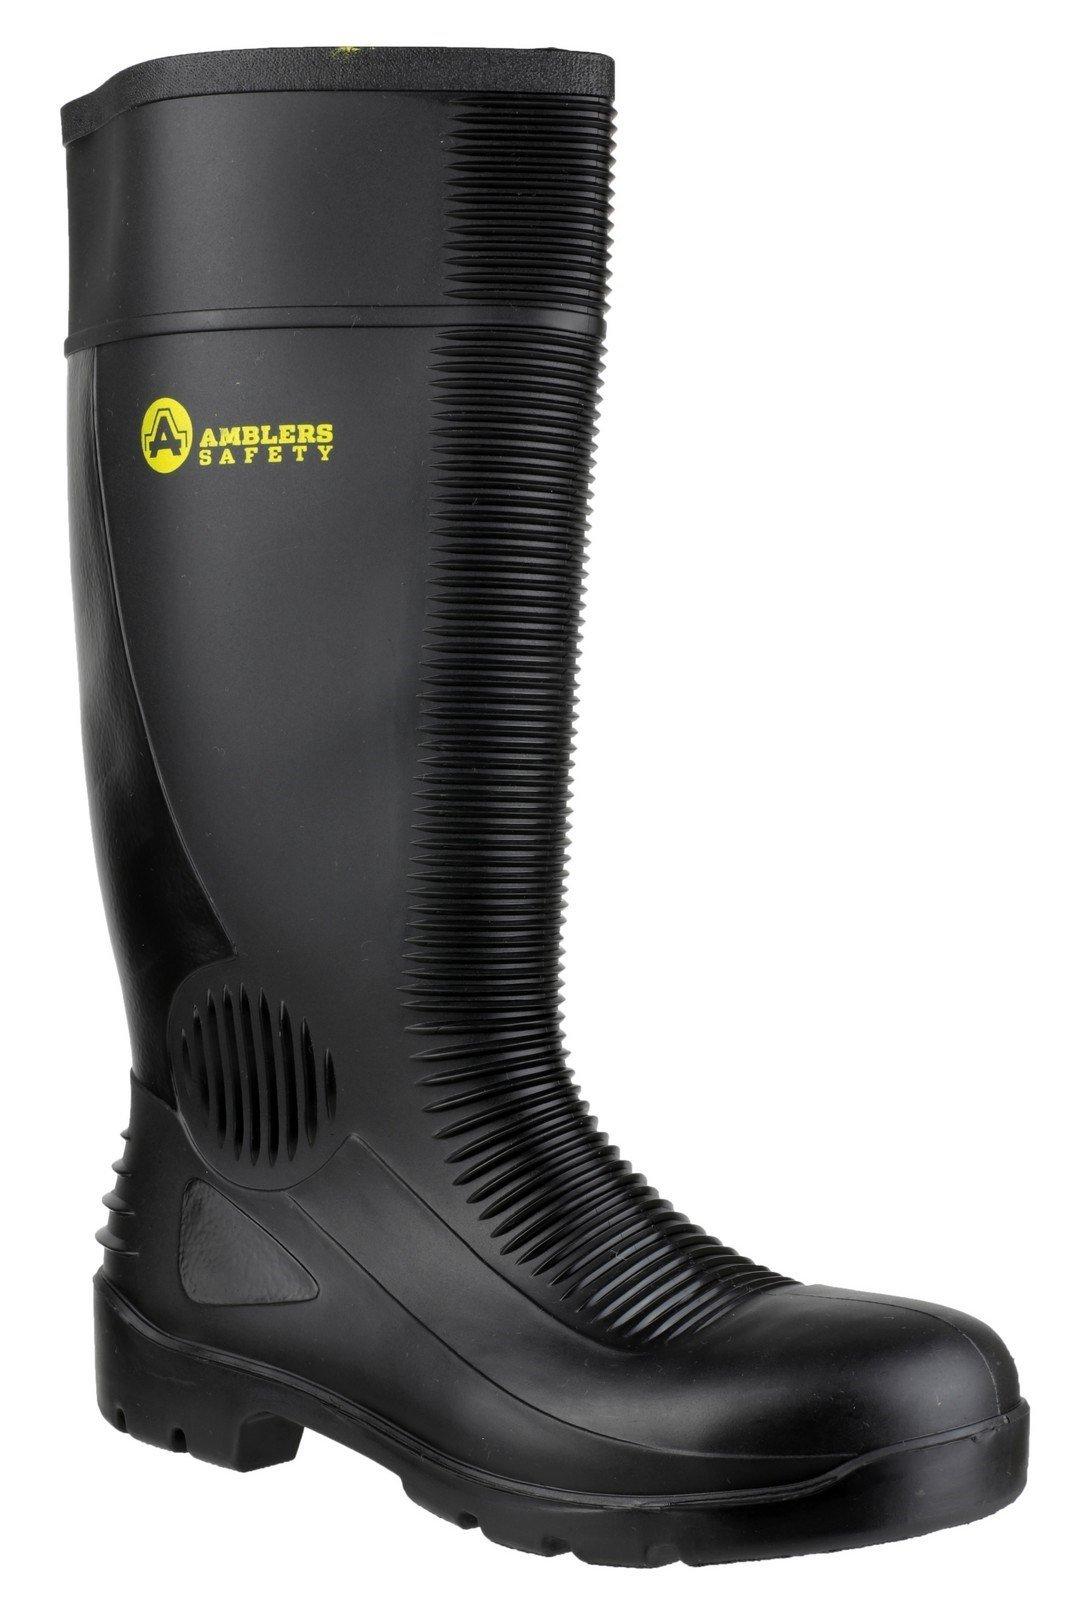 Amblers Unisex Safety Construction Wellington Boot Black 21233 - Black 5